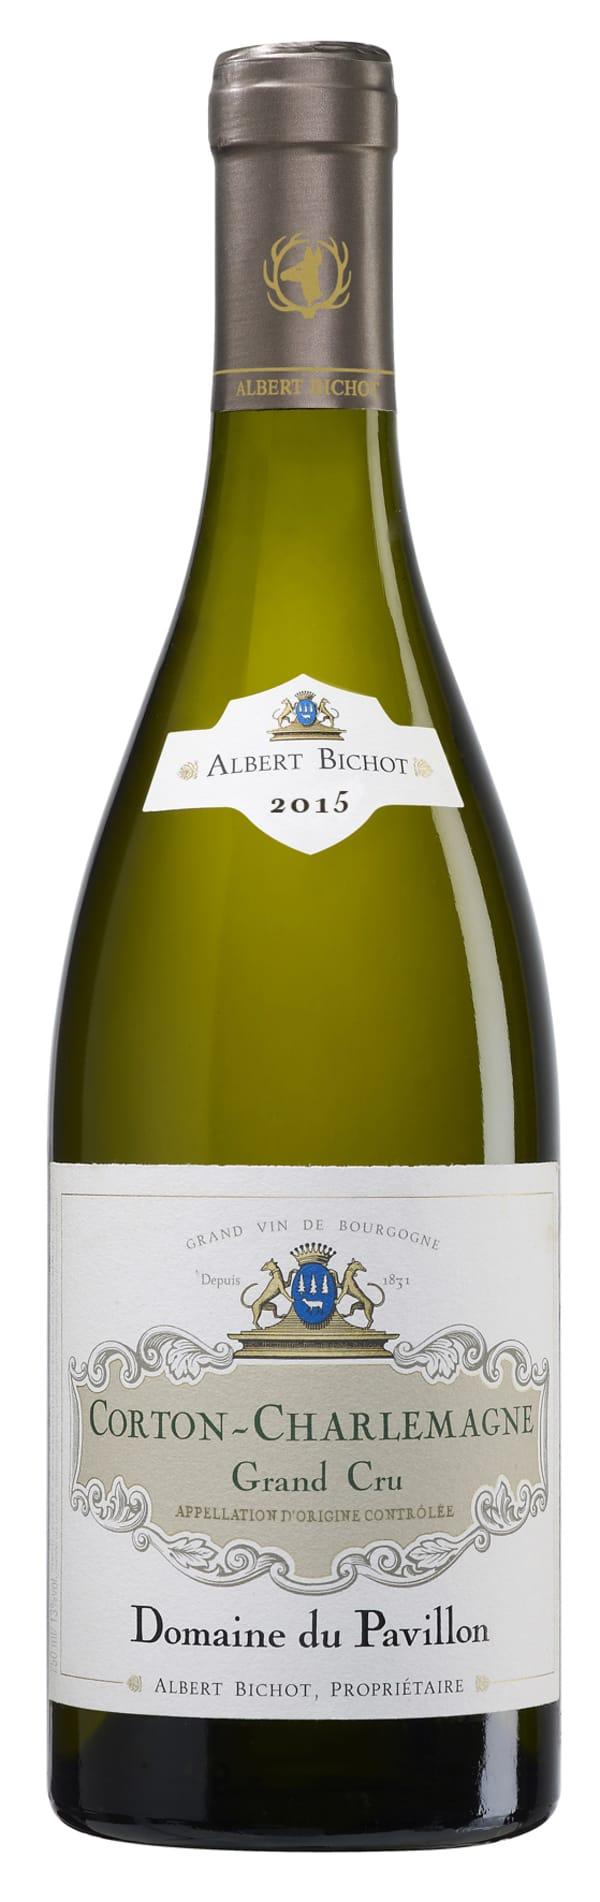 Albert Bichot Domaine du Pavillon Corton-Charlemagne Grand Cru 2015